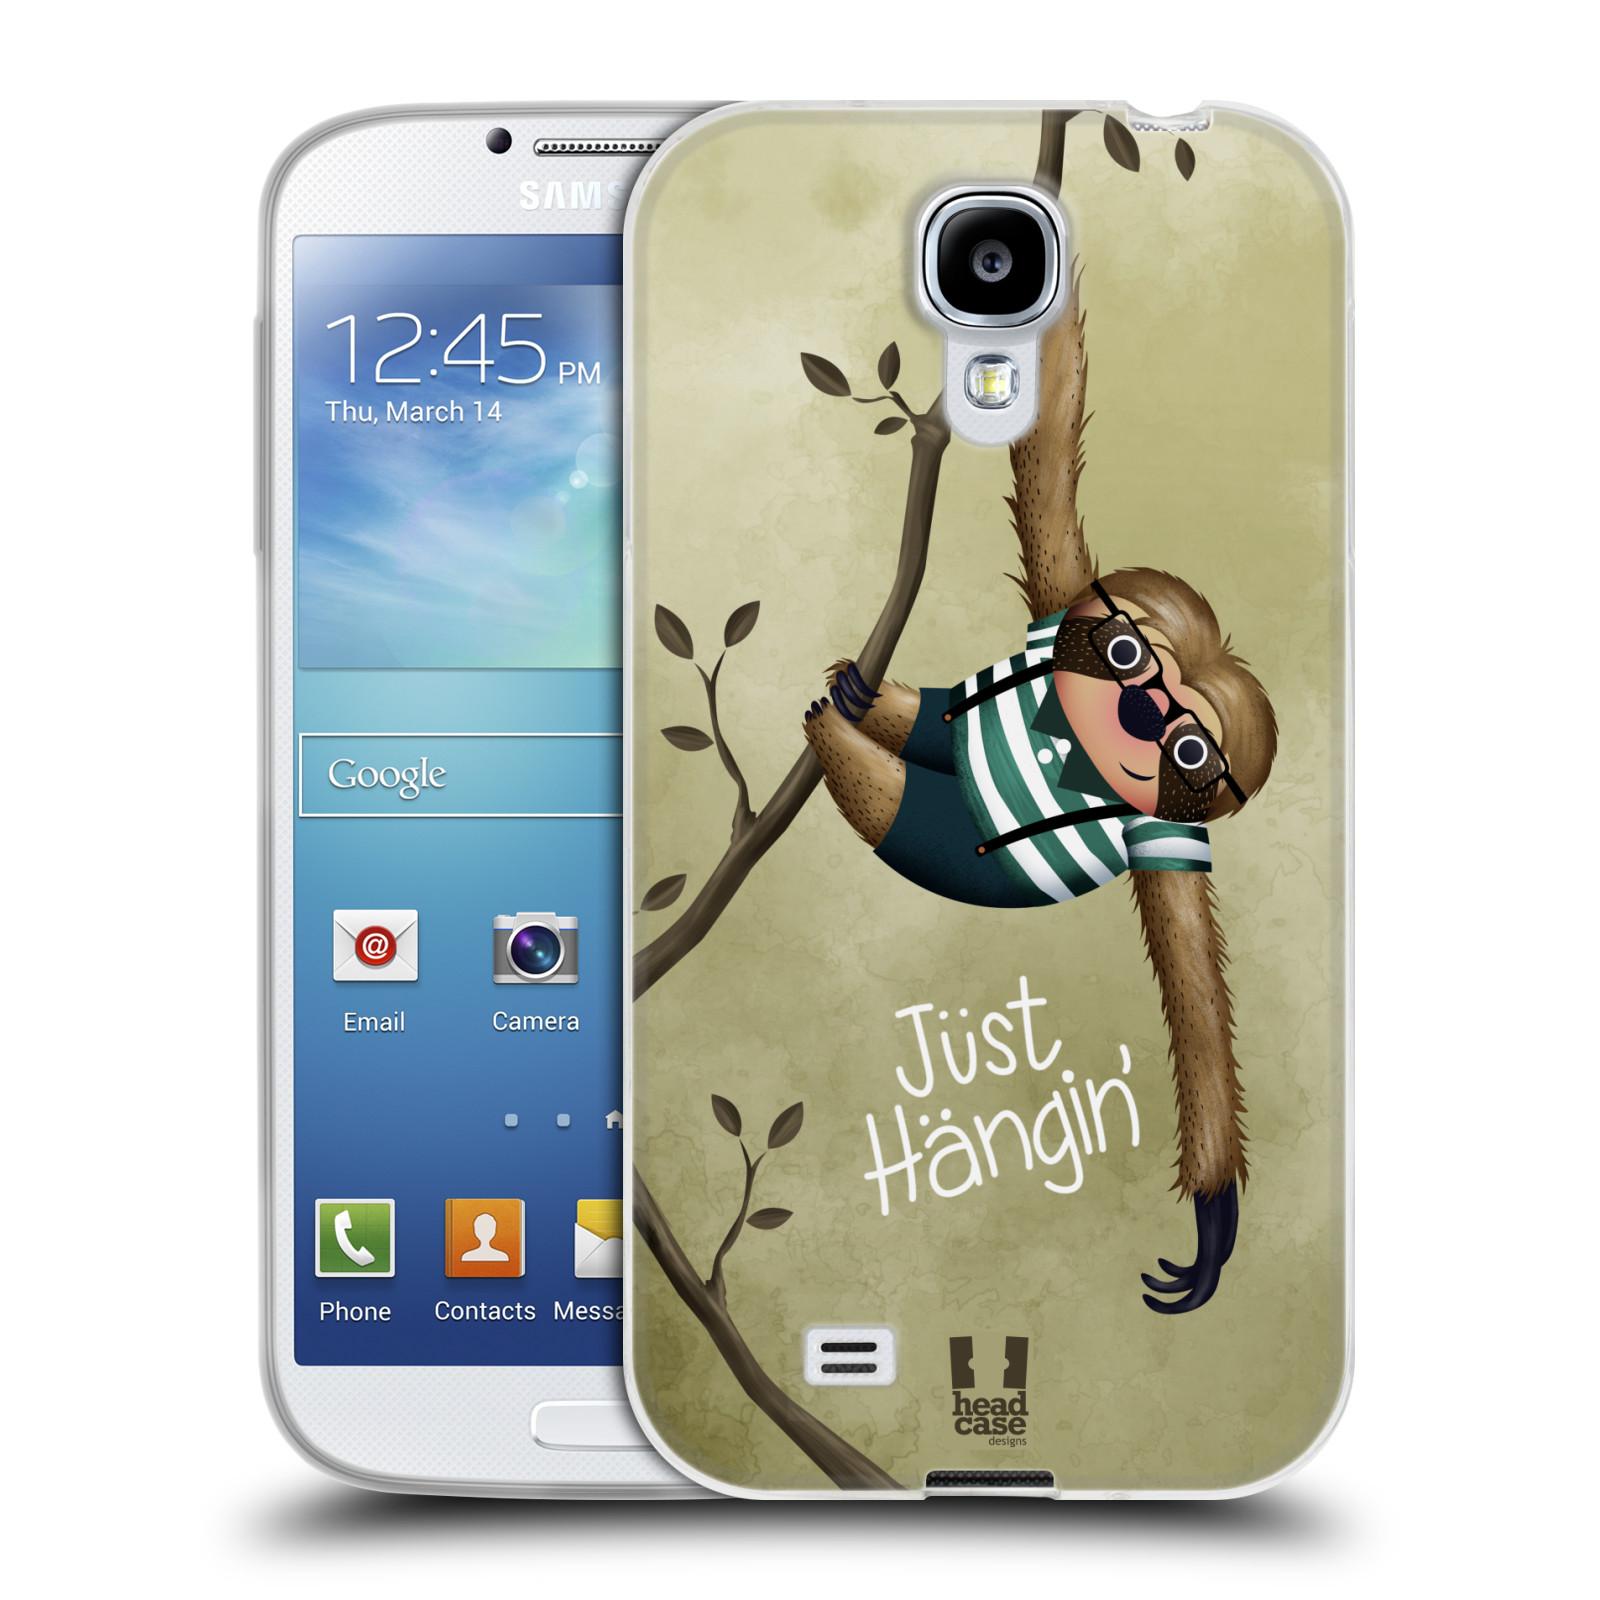 Silikonové pouzdro na mobil Samsung Galaxy S4 HEAD CASE Lenochod Just Hangin (Silikonový kryt či obal na mobilní telefon Samsung Galaxy S4 GT-i9505 / i9500)